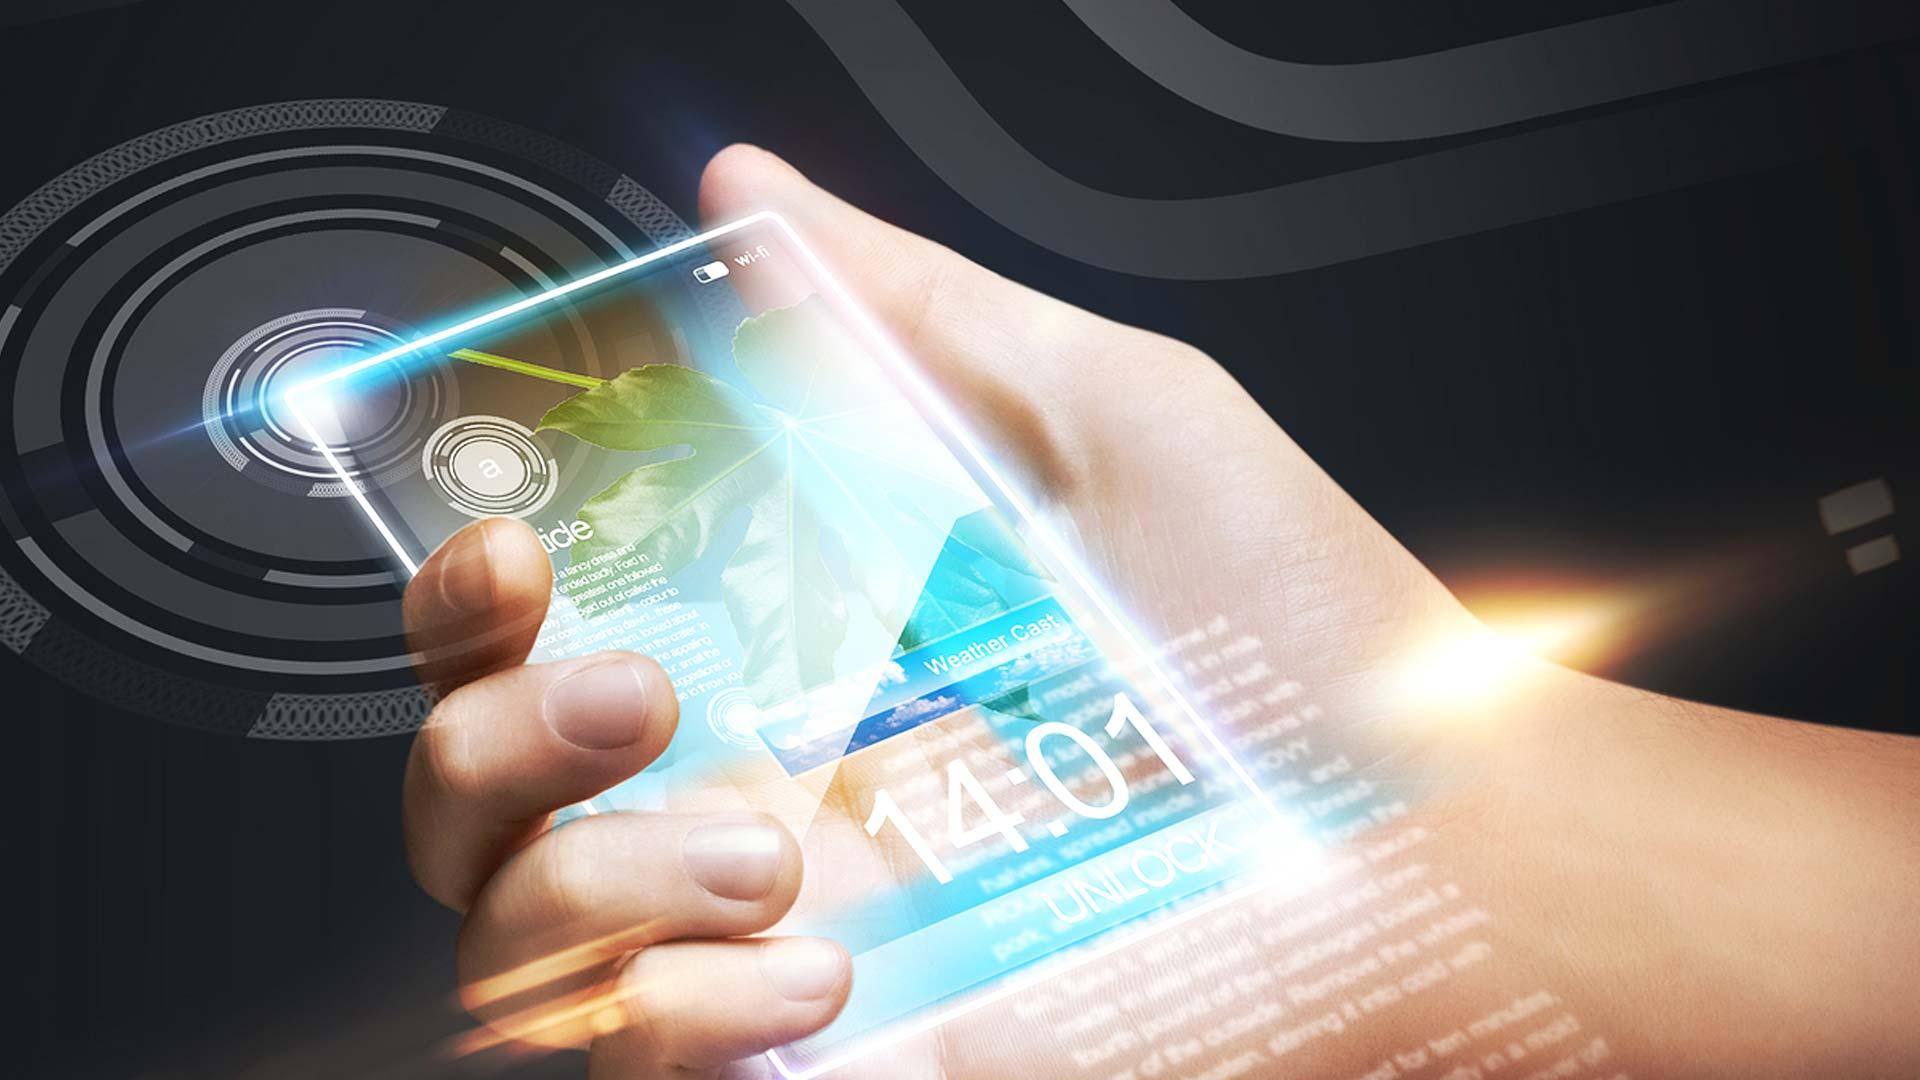 high-tech-mobile-phones.jpg